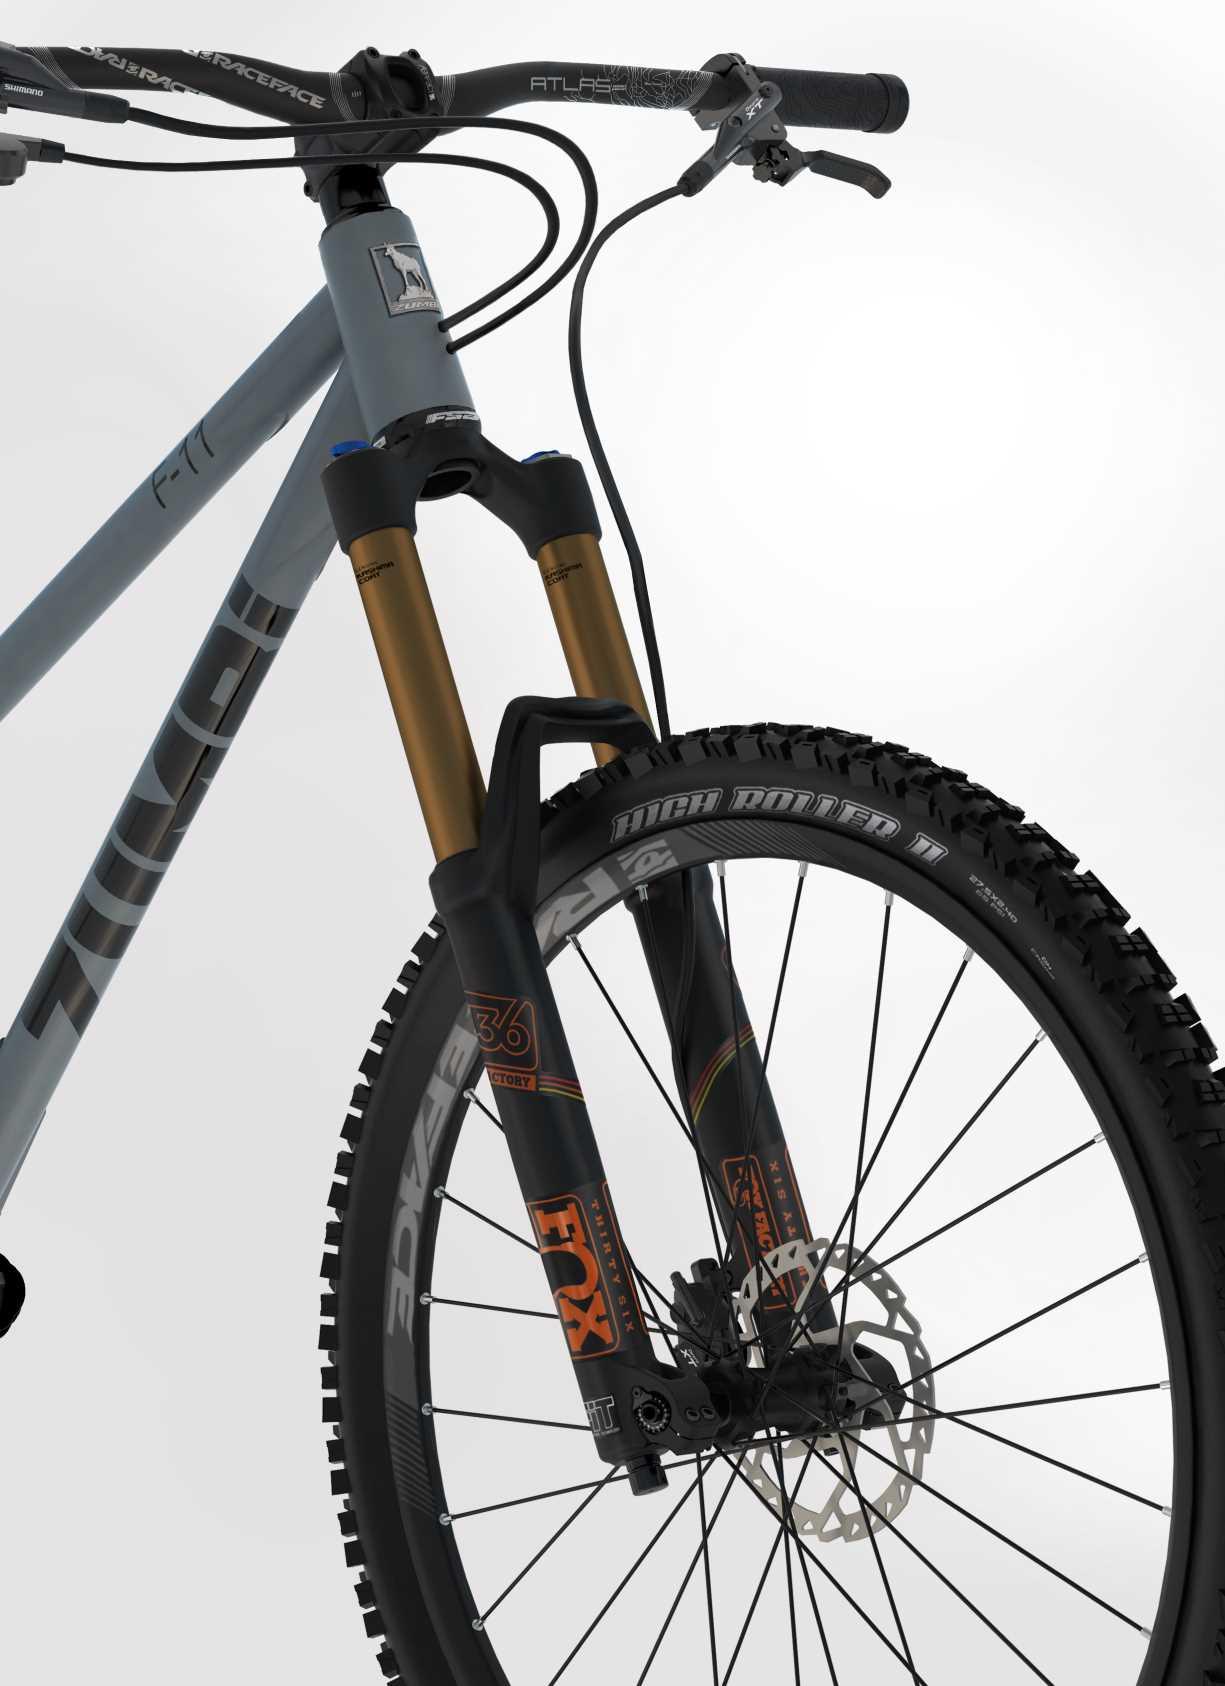 Mtb Full Bike F11 650b Boost Zumbi Cycles Element Fullsus Pride 20 Greey Red Manufactor 3